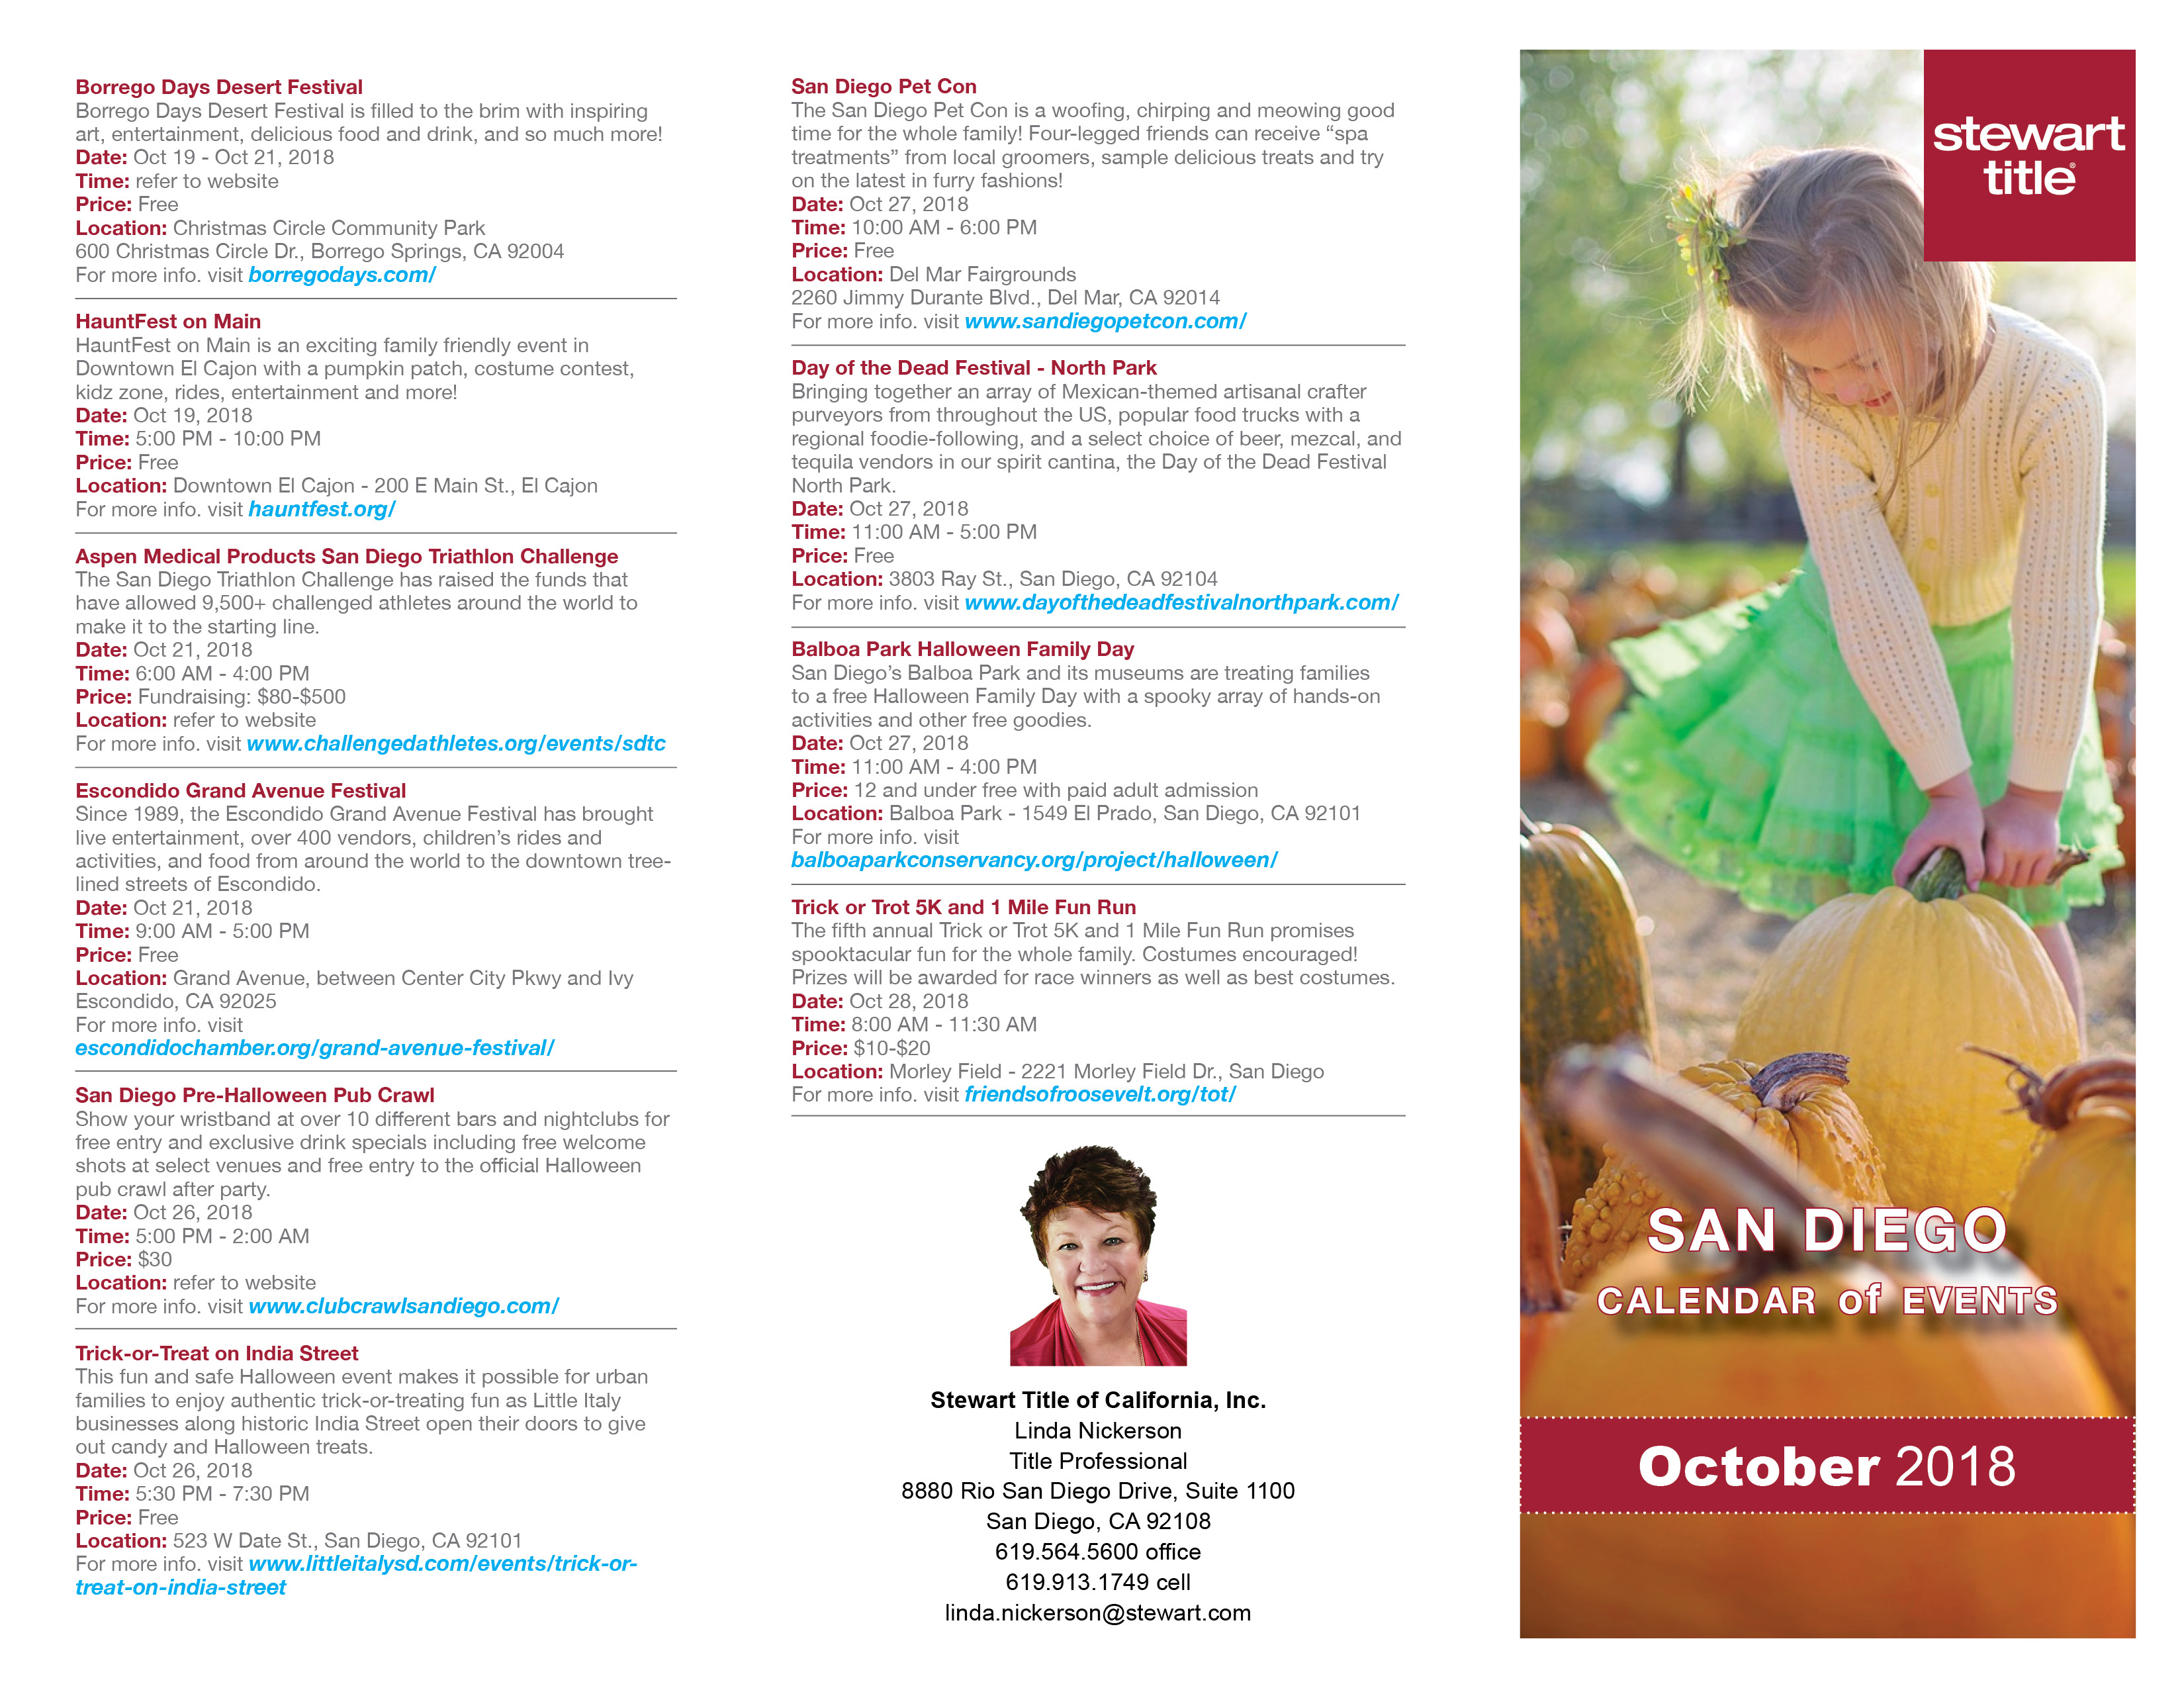 Calendar events SD October 2018-Linda Nickerson